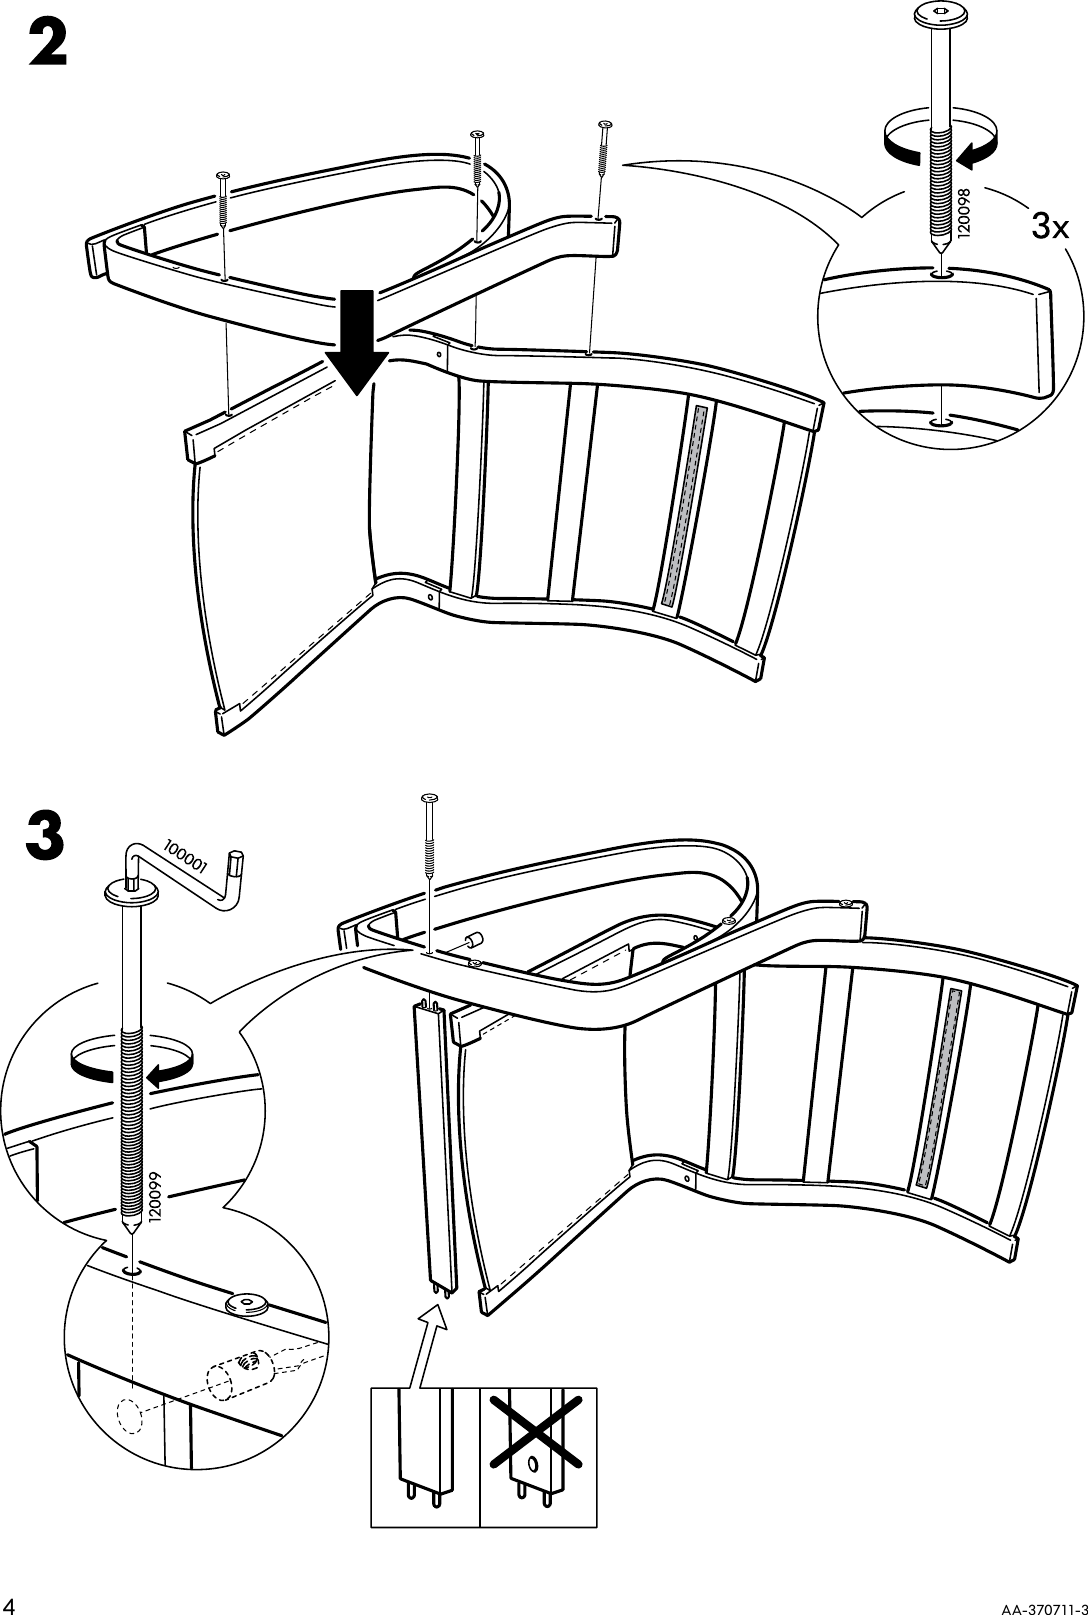 Strange Ikea Poang Rocking Chair Frame Assembly Instruction Spiritservingveterans Wood Chair Design Ideas Spiritservingveteransorg